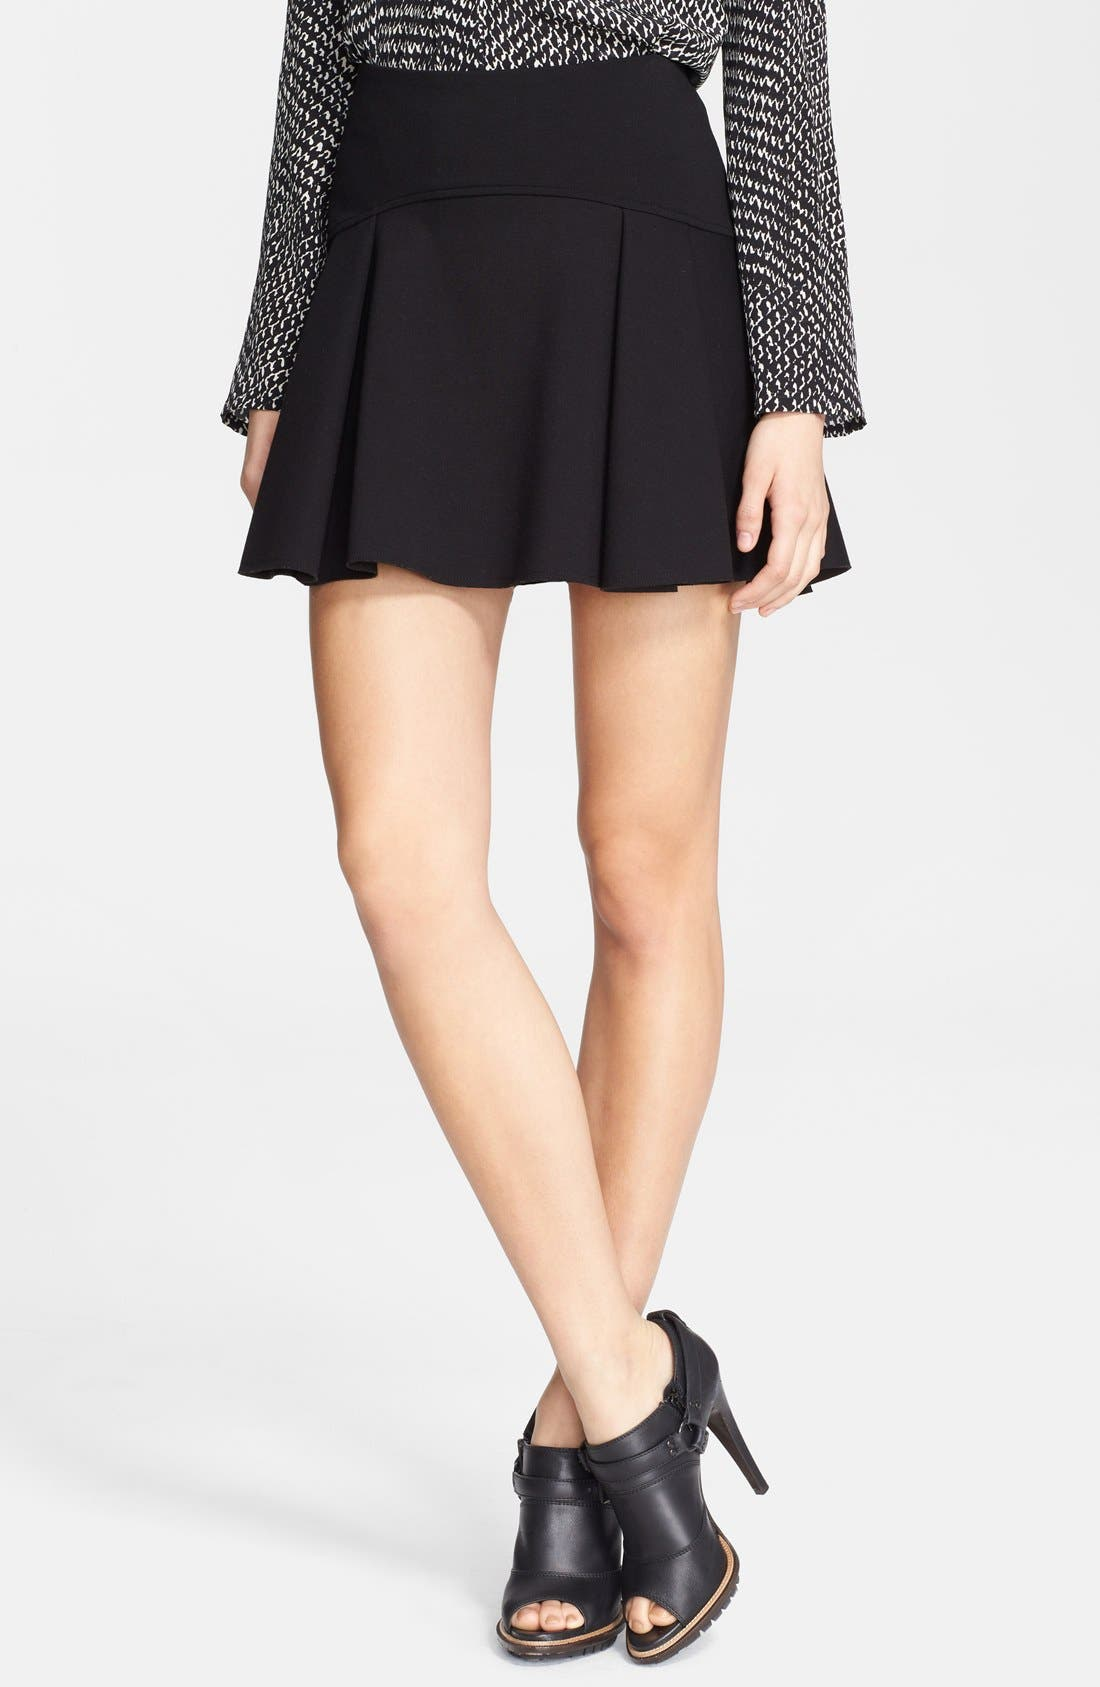 Alternate Image 1 Selected - Belstaff 'Tadley' Flared Jersey Skirt